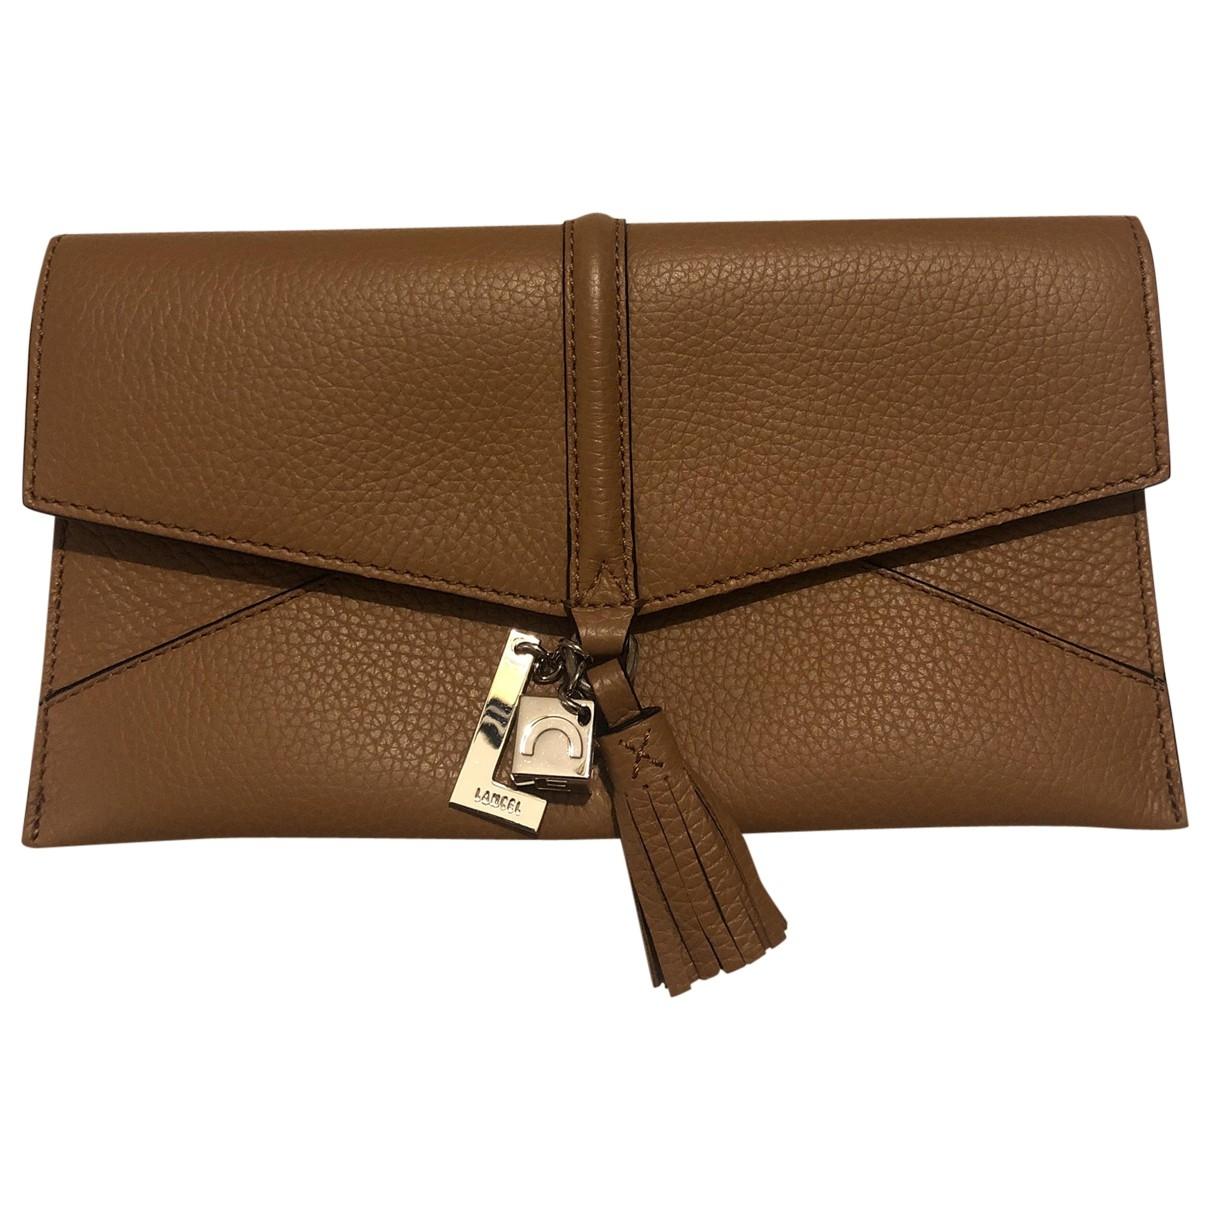 Lancel \N Brown Leather Clutch bag for Women \N